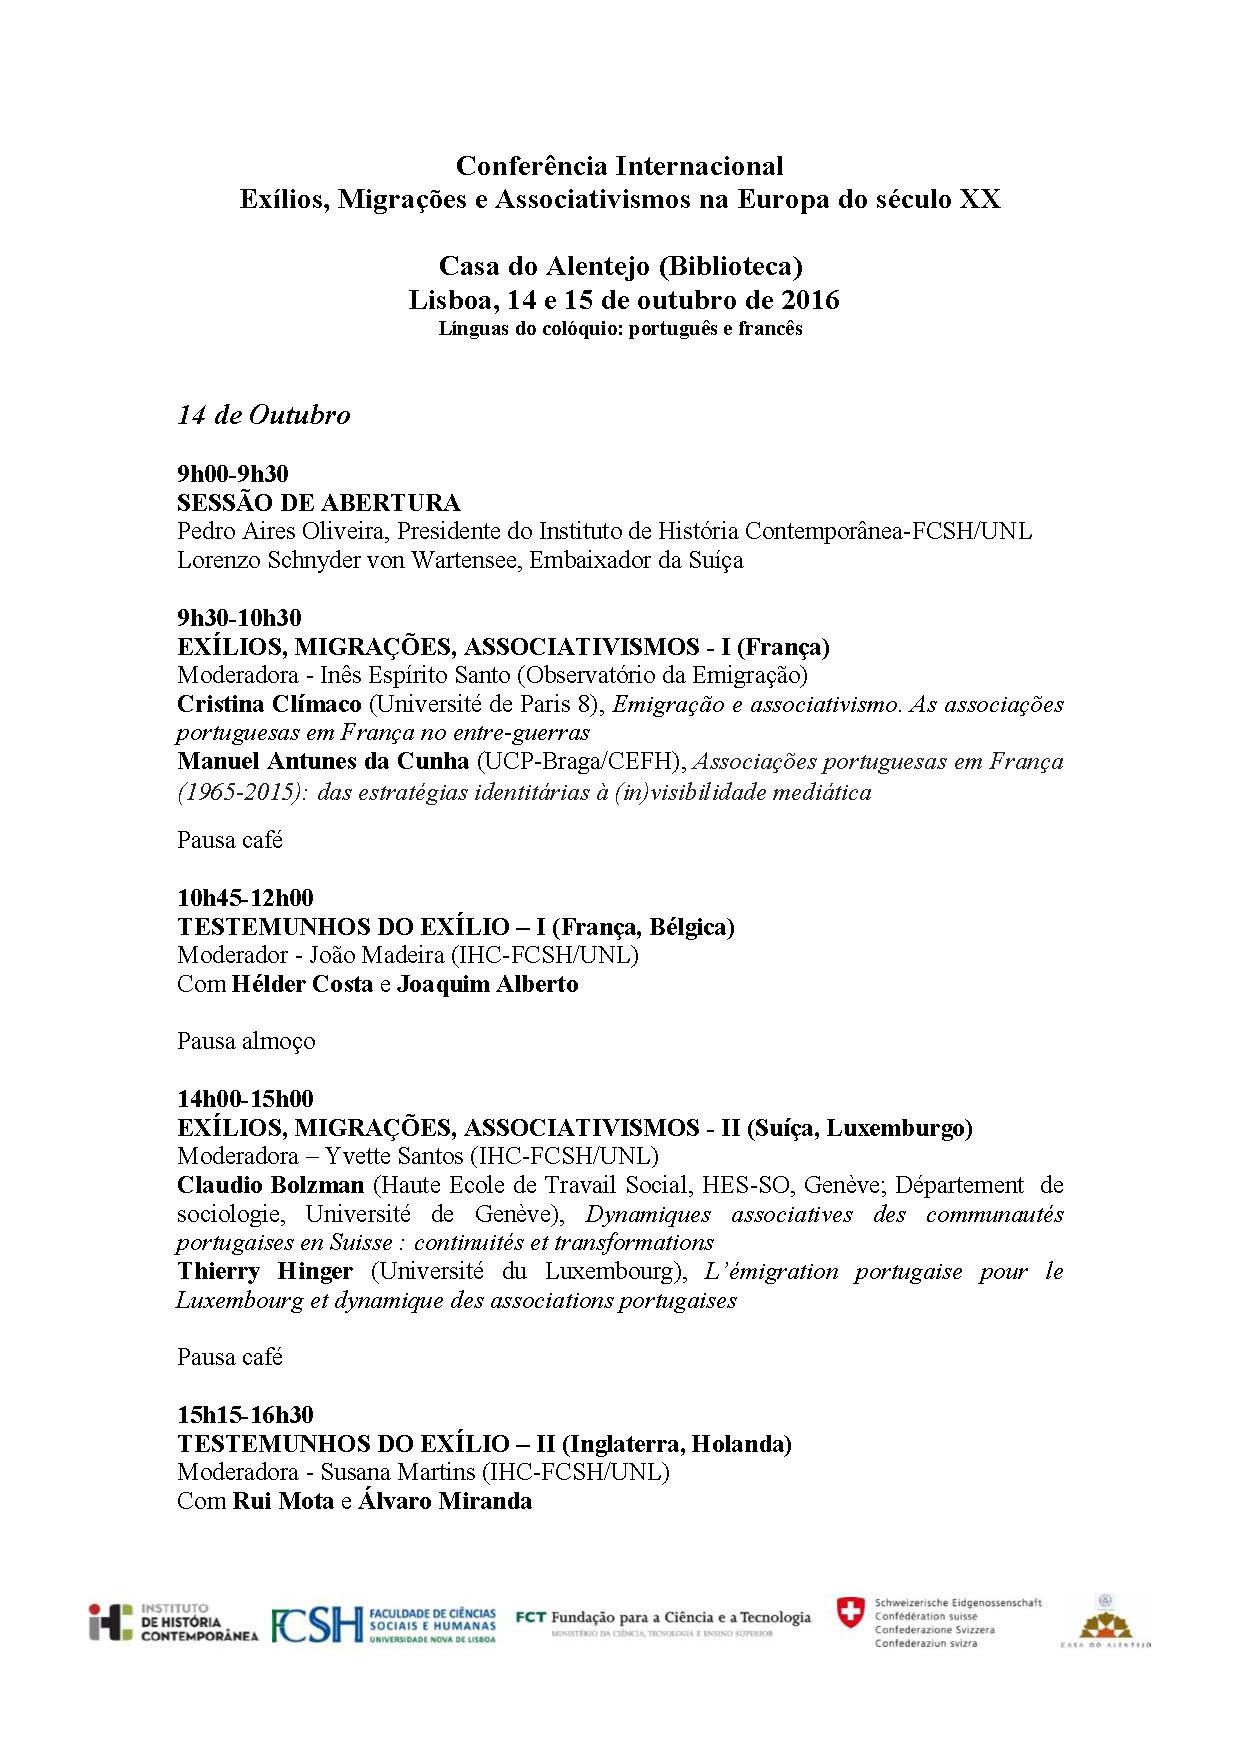 programa-definitivo-exilios-migrac%cc%a7oes-associativismos_page_1